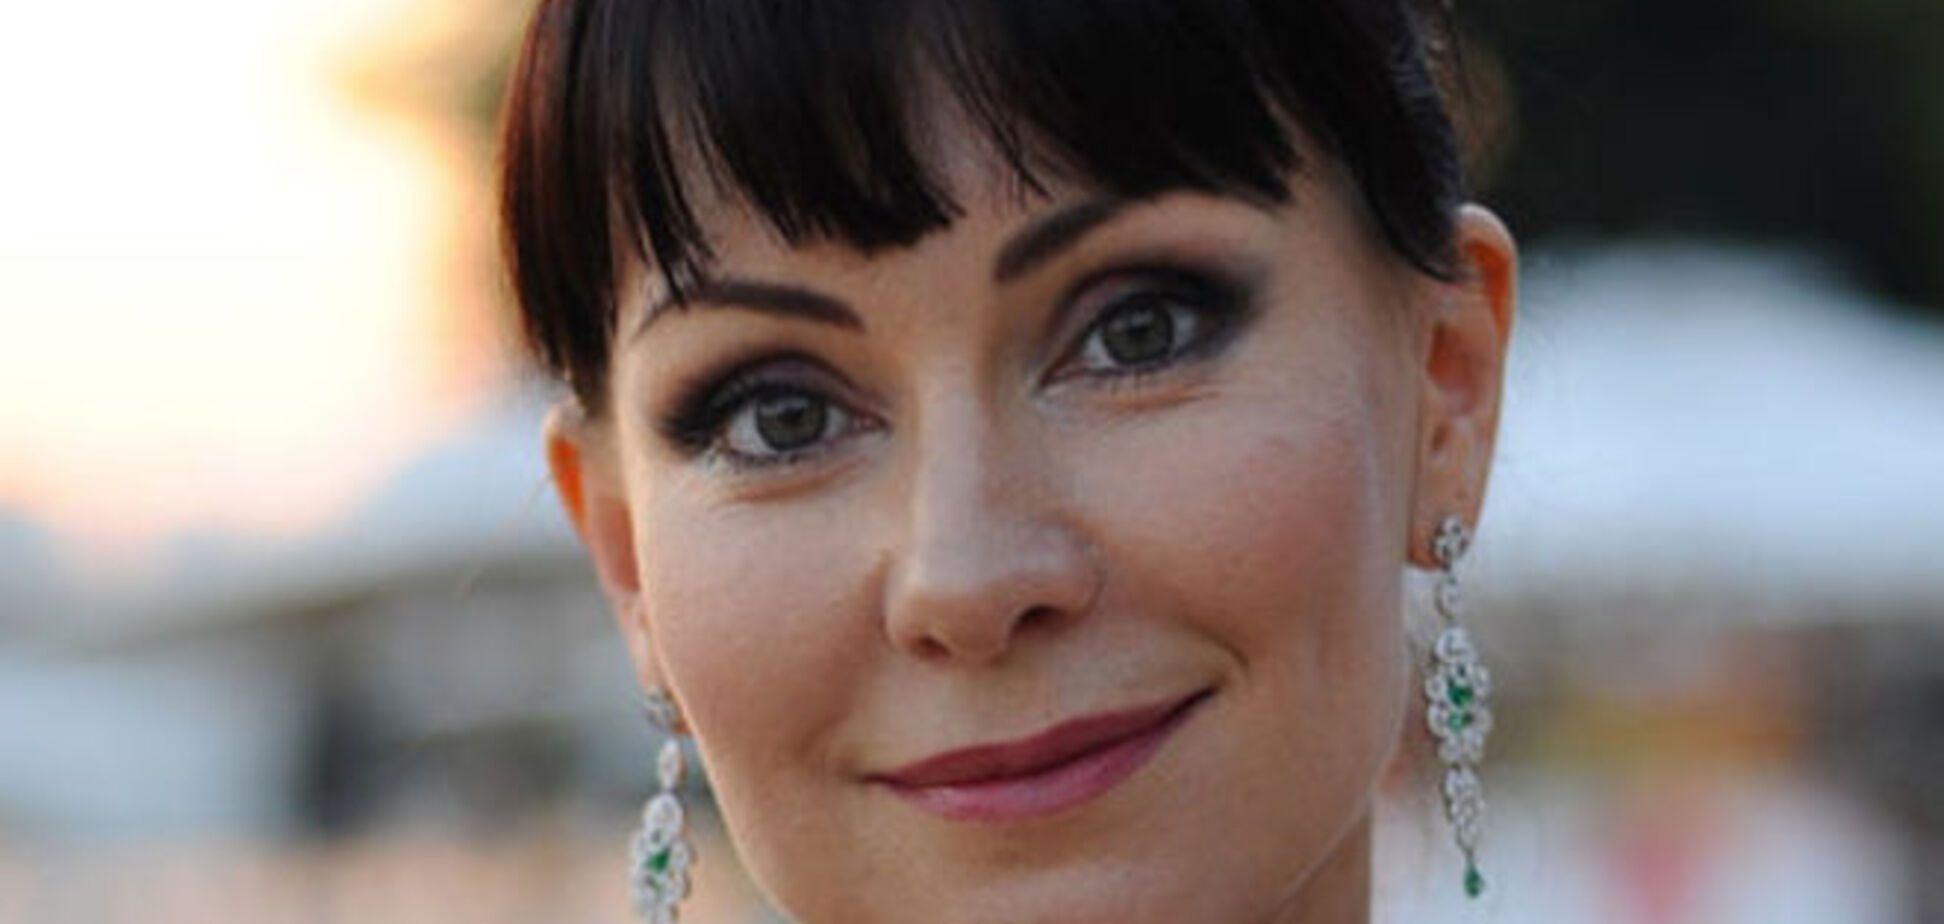 Нонна Гришаева закрутила роман на стороне